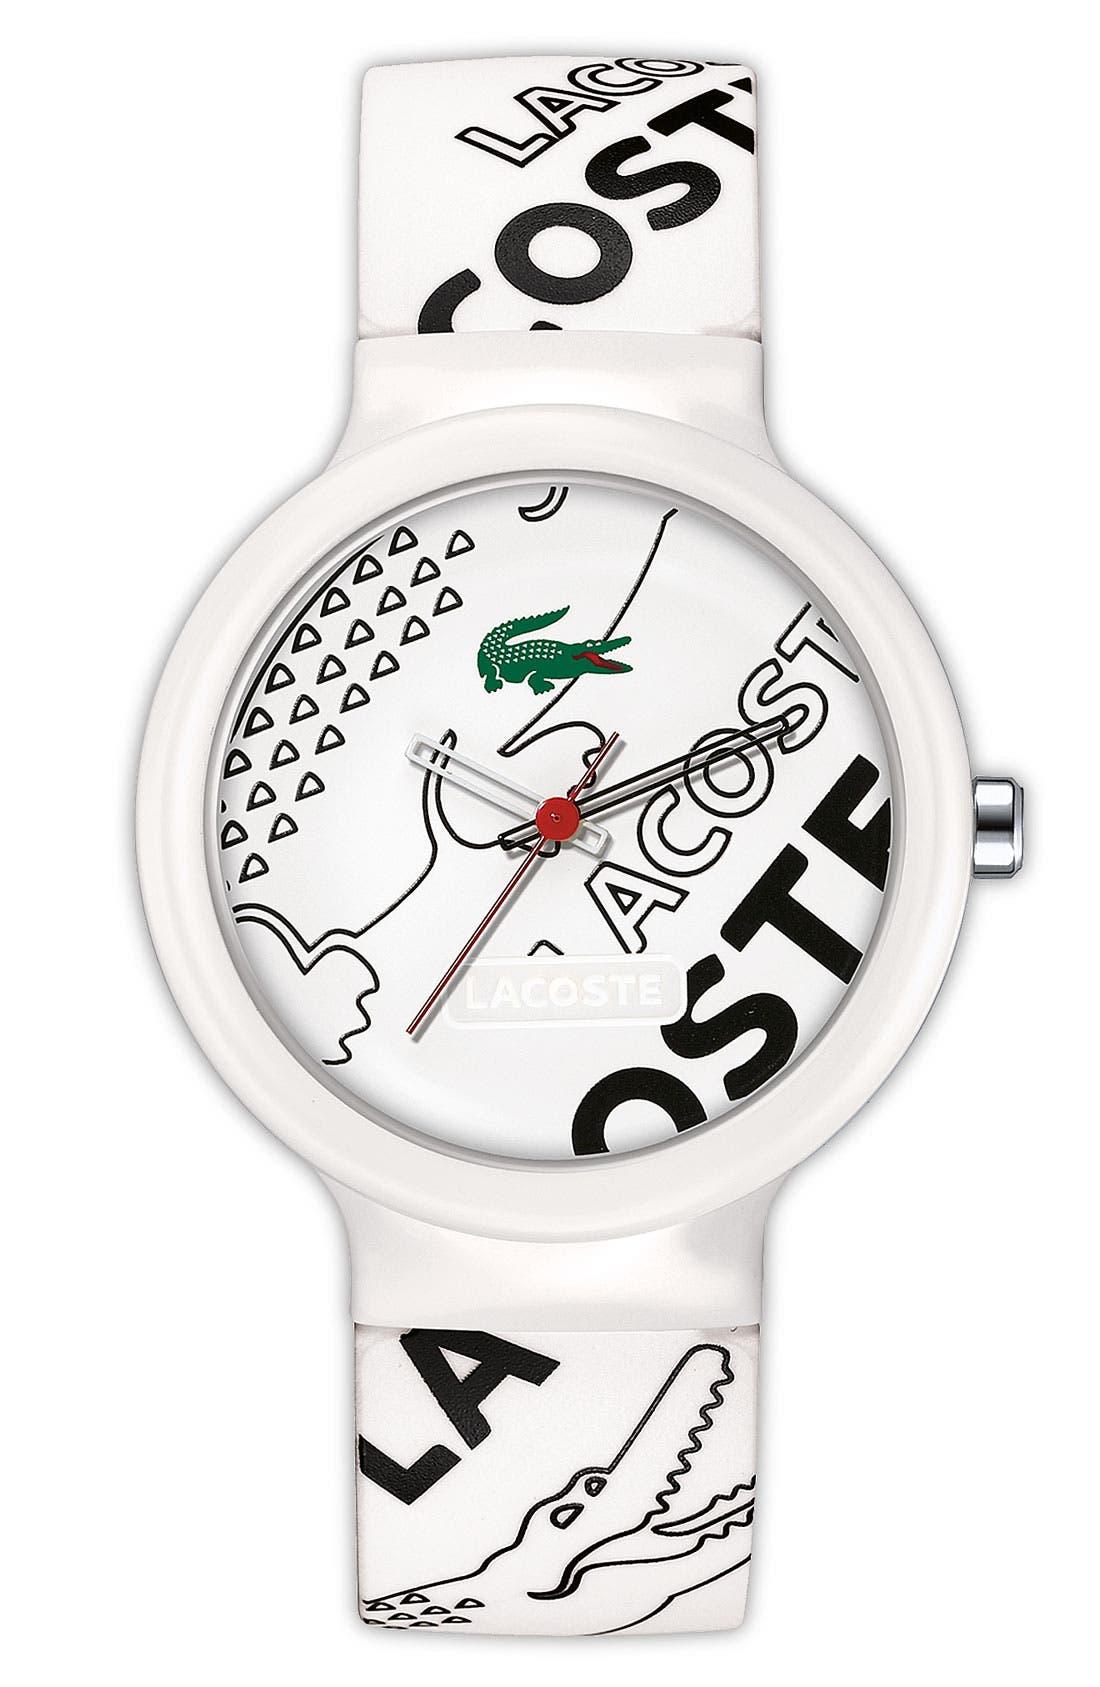 Main Image - Lacoste 'Goa' Logo Strap Watch, 40mm